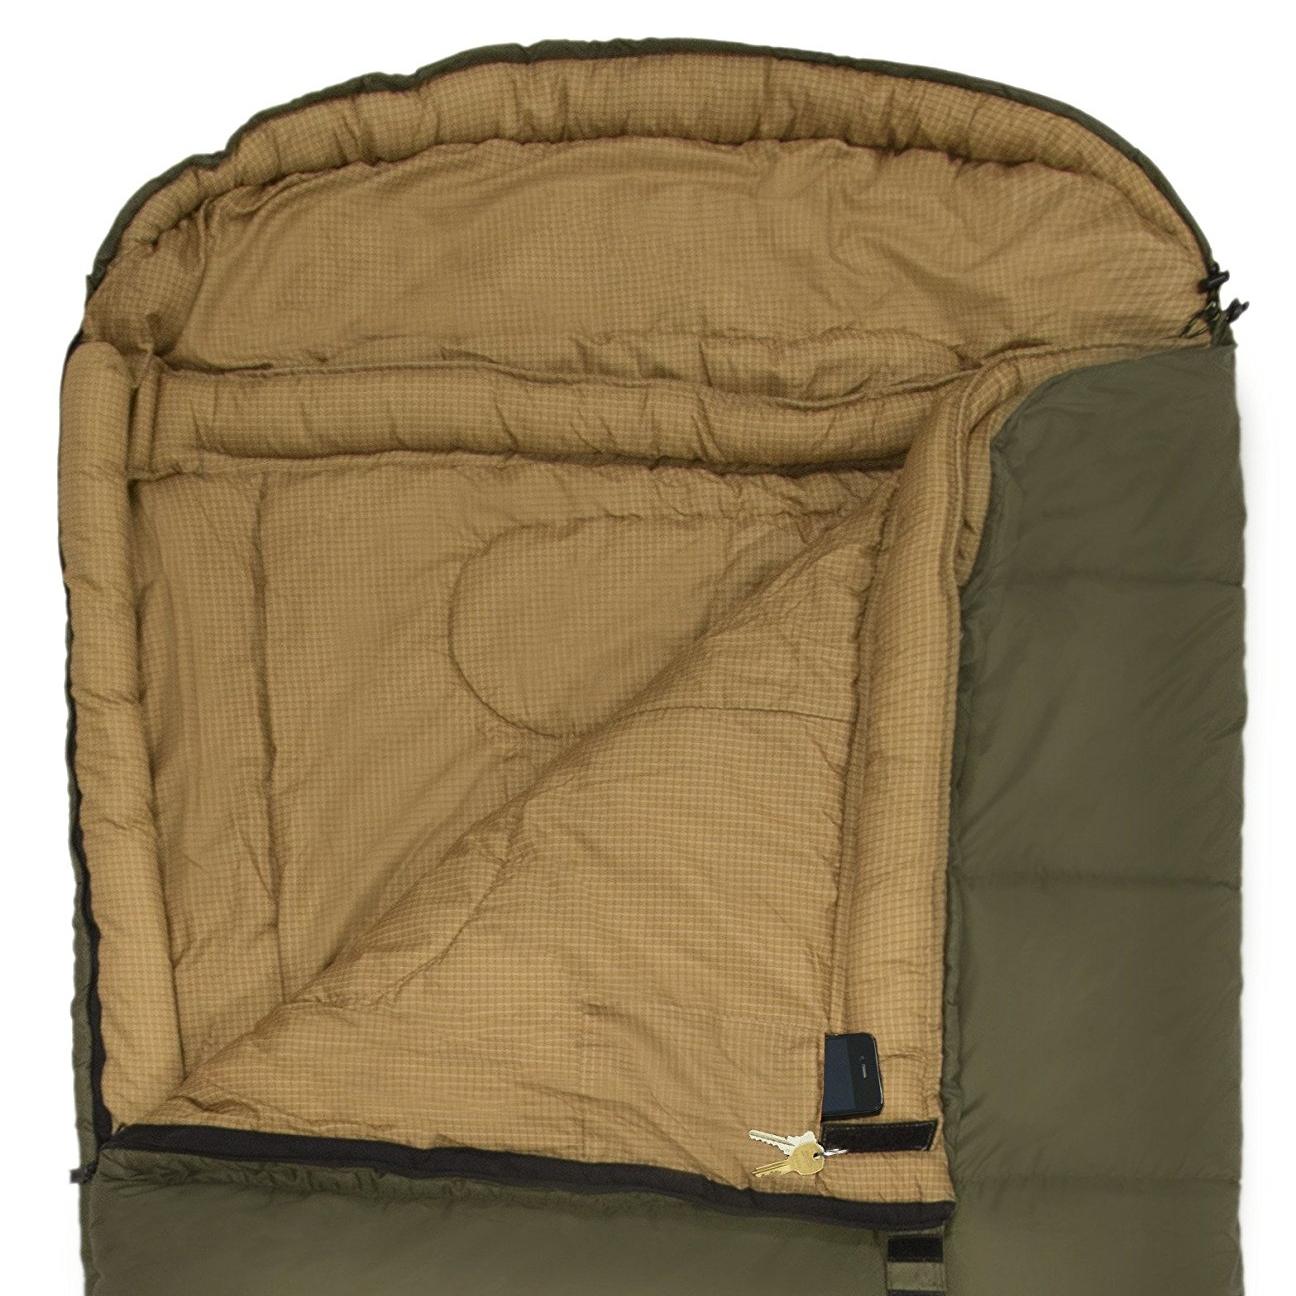 TETON XL Sleeping Bag